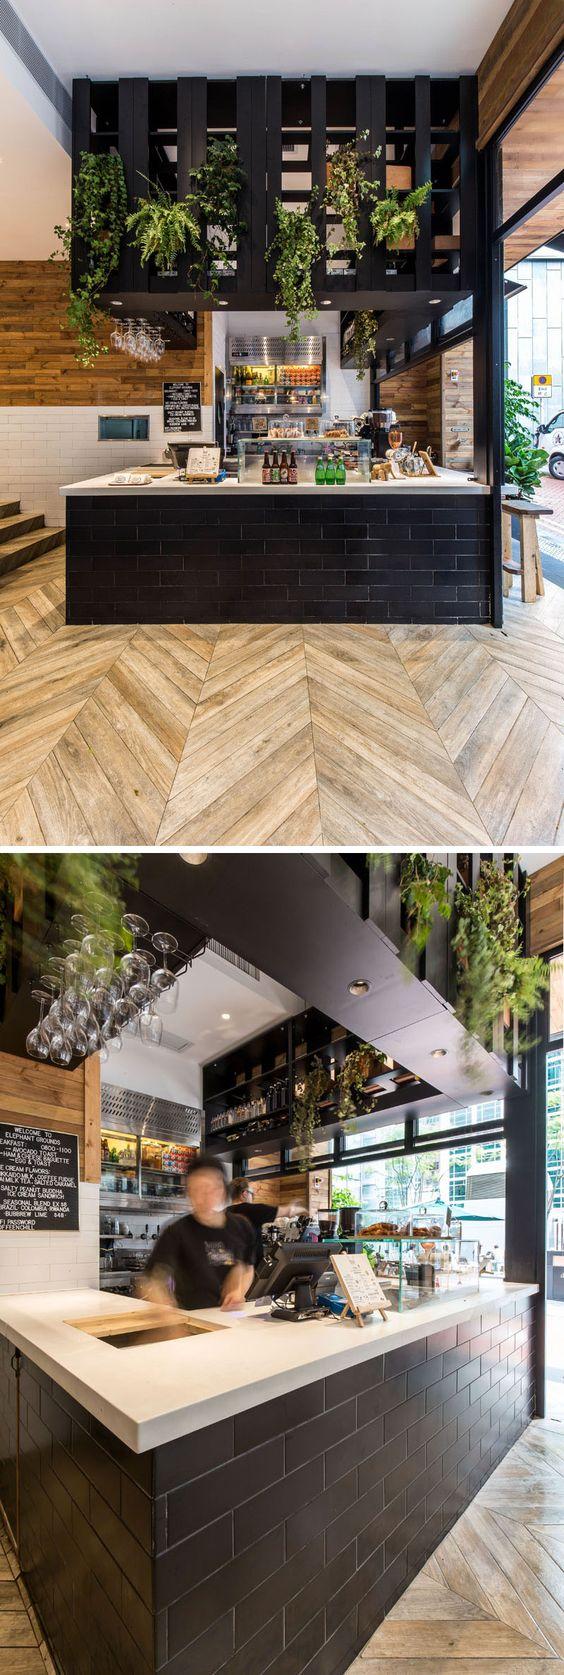 designing-cafe